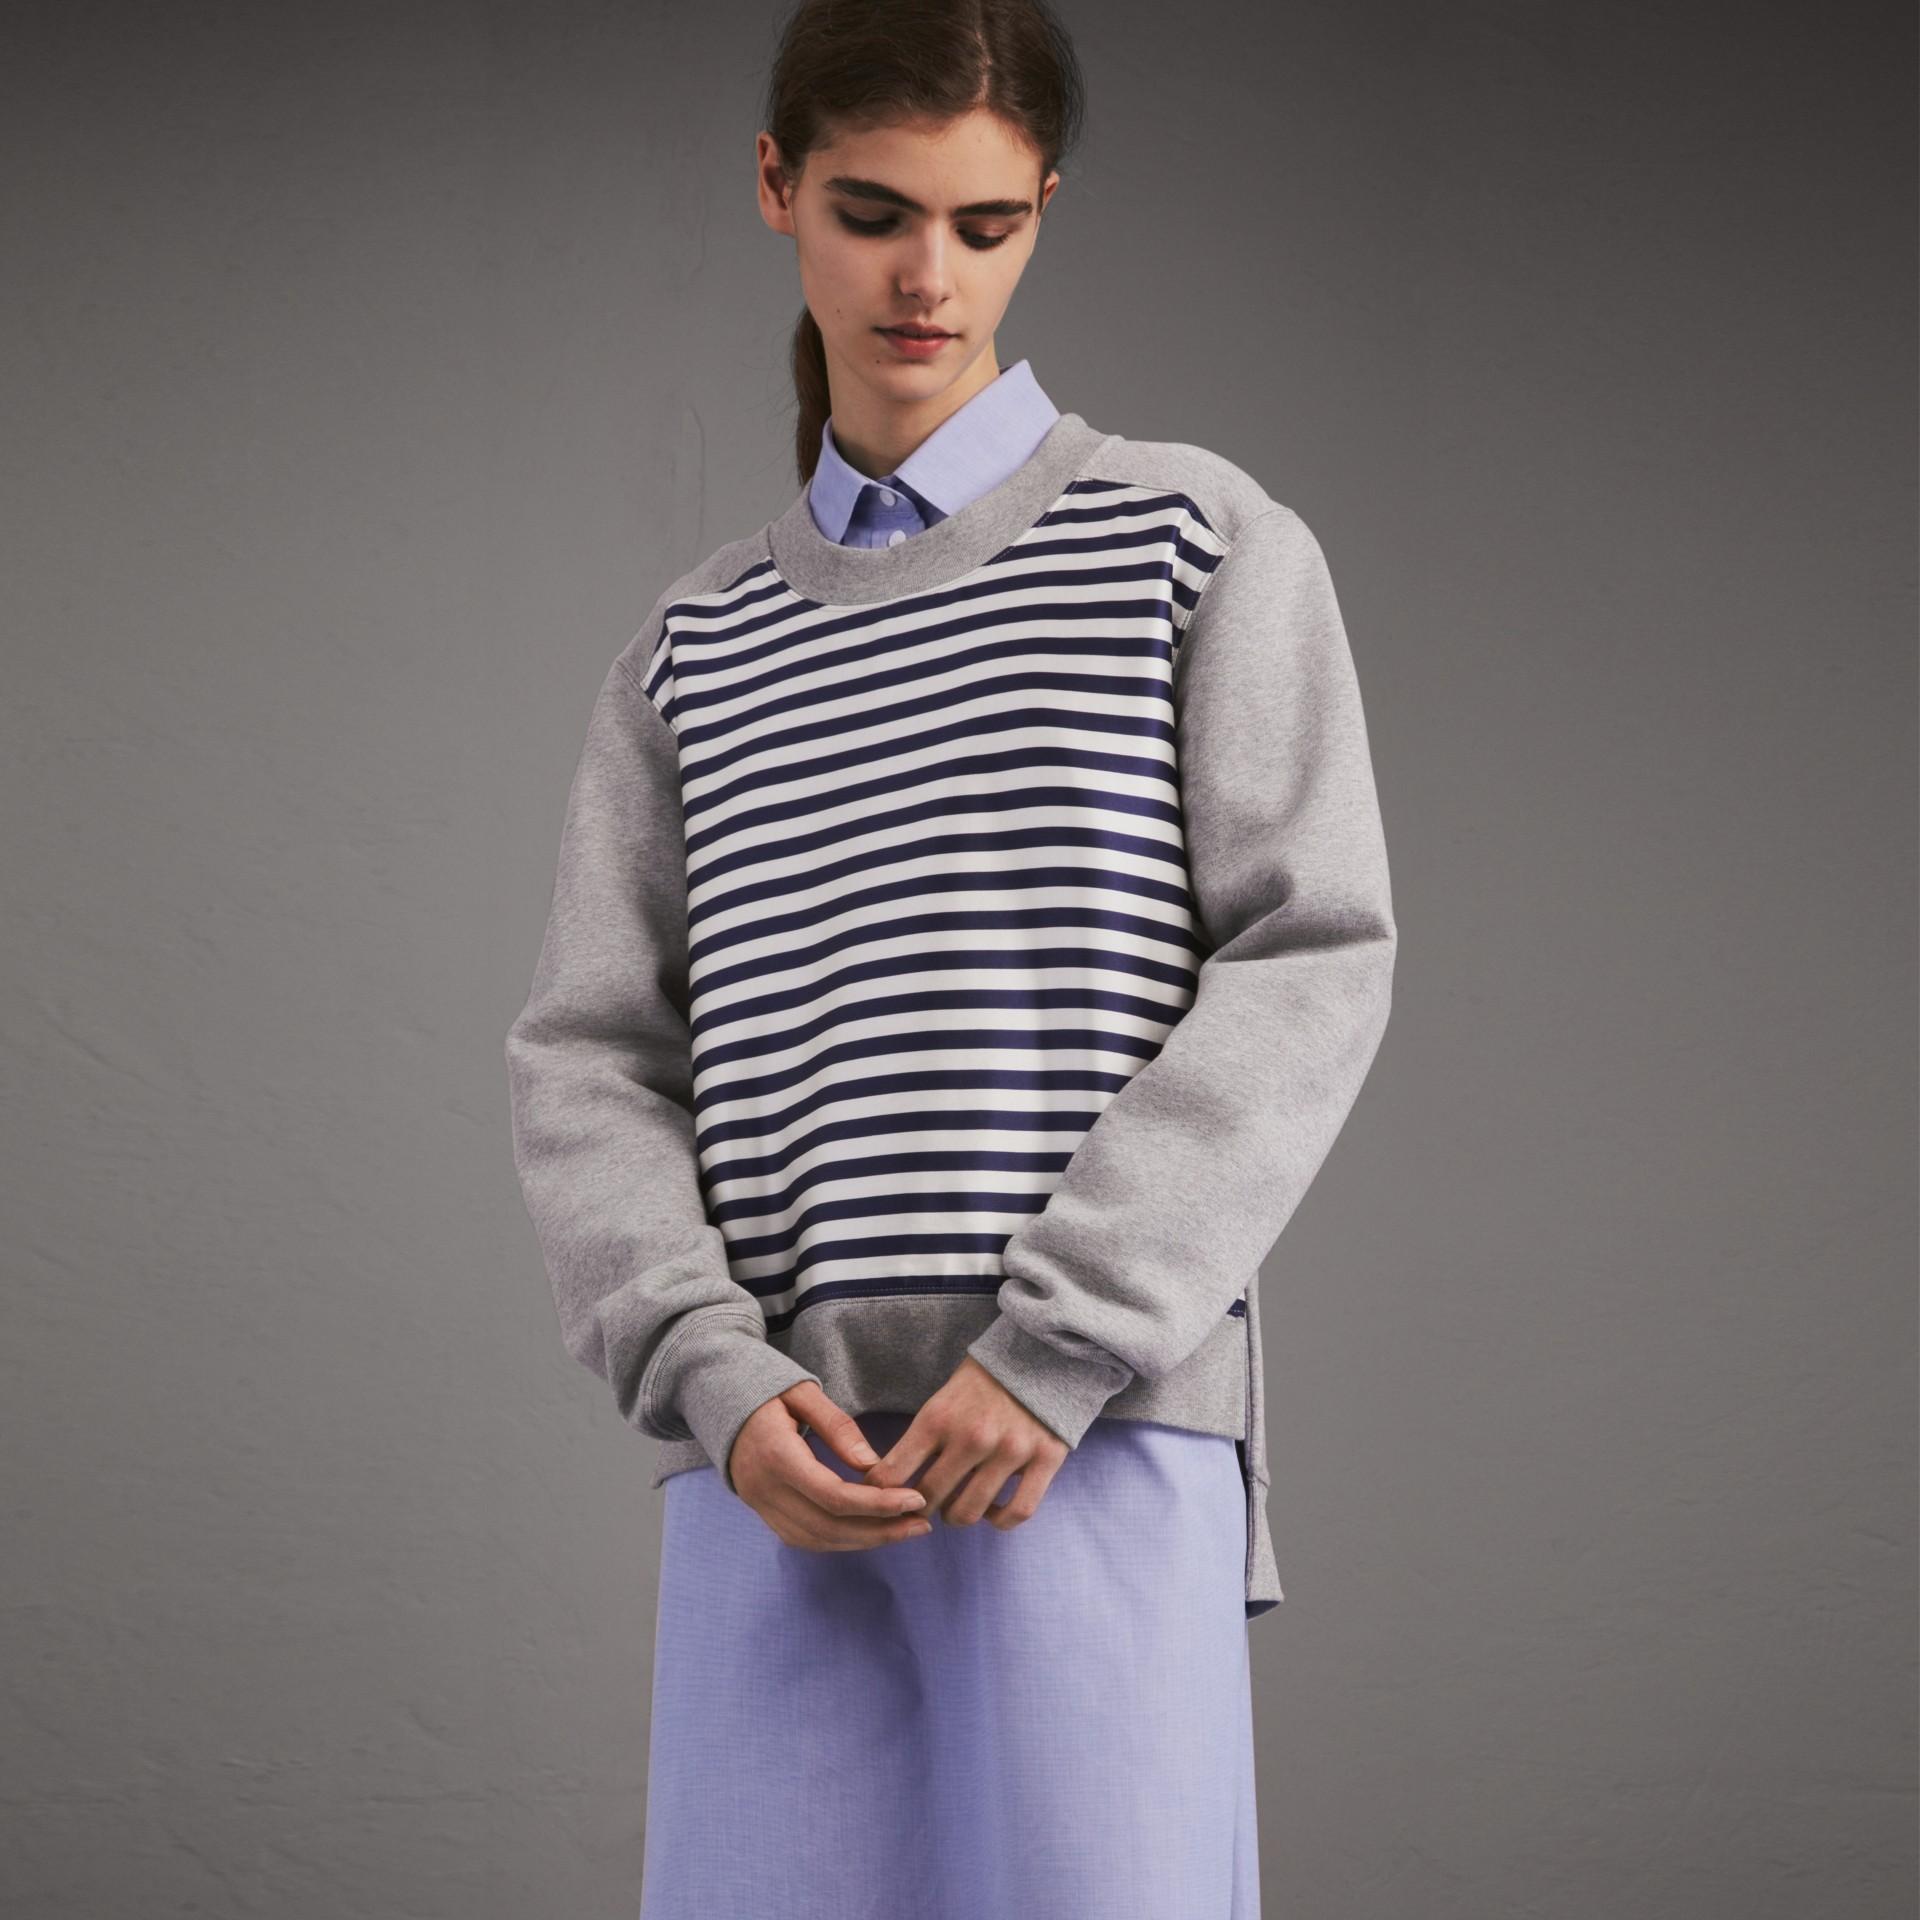 Unisex Striped Silk Cotton Panel Sweatshirt - gallery image 1